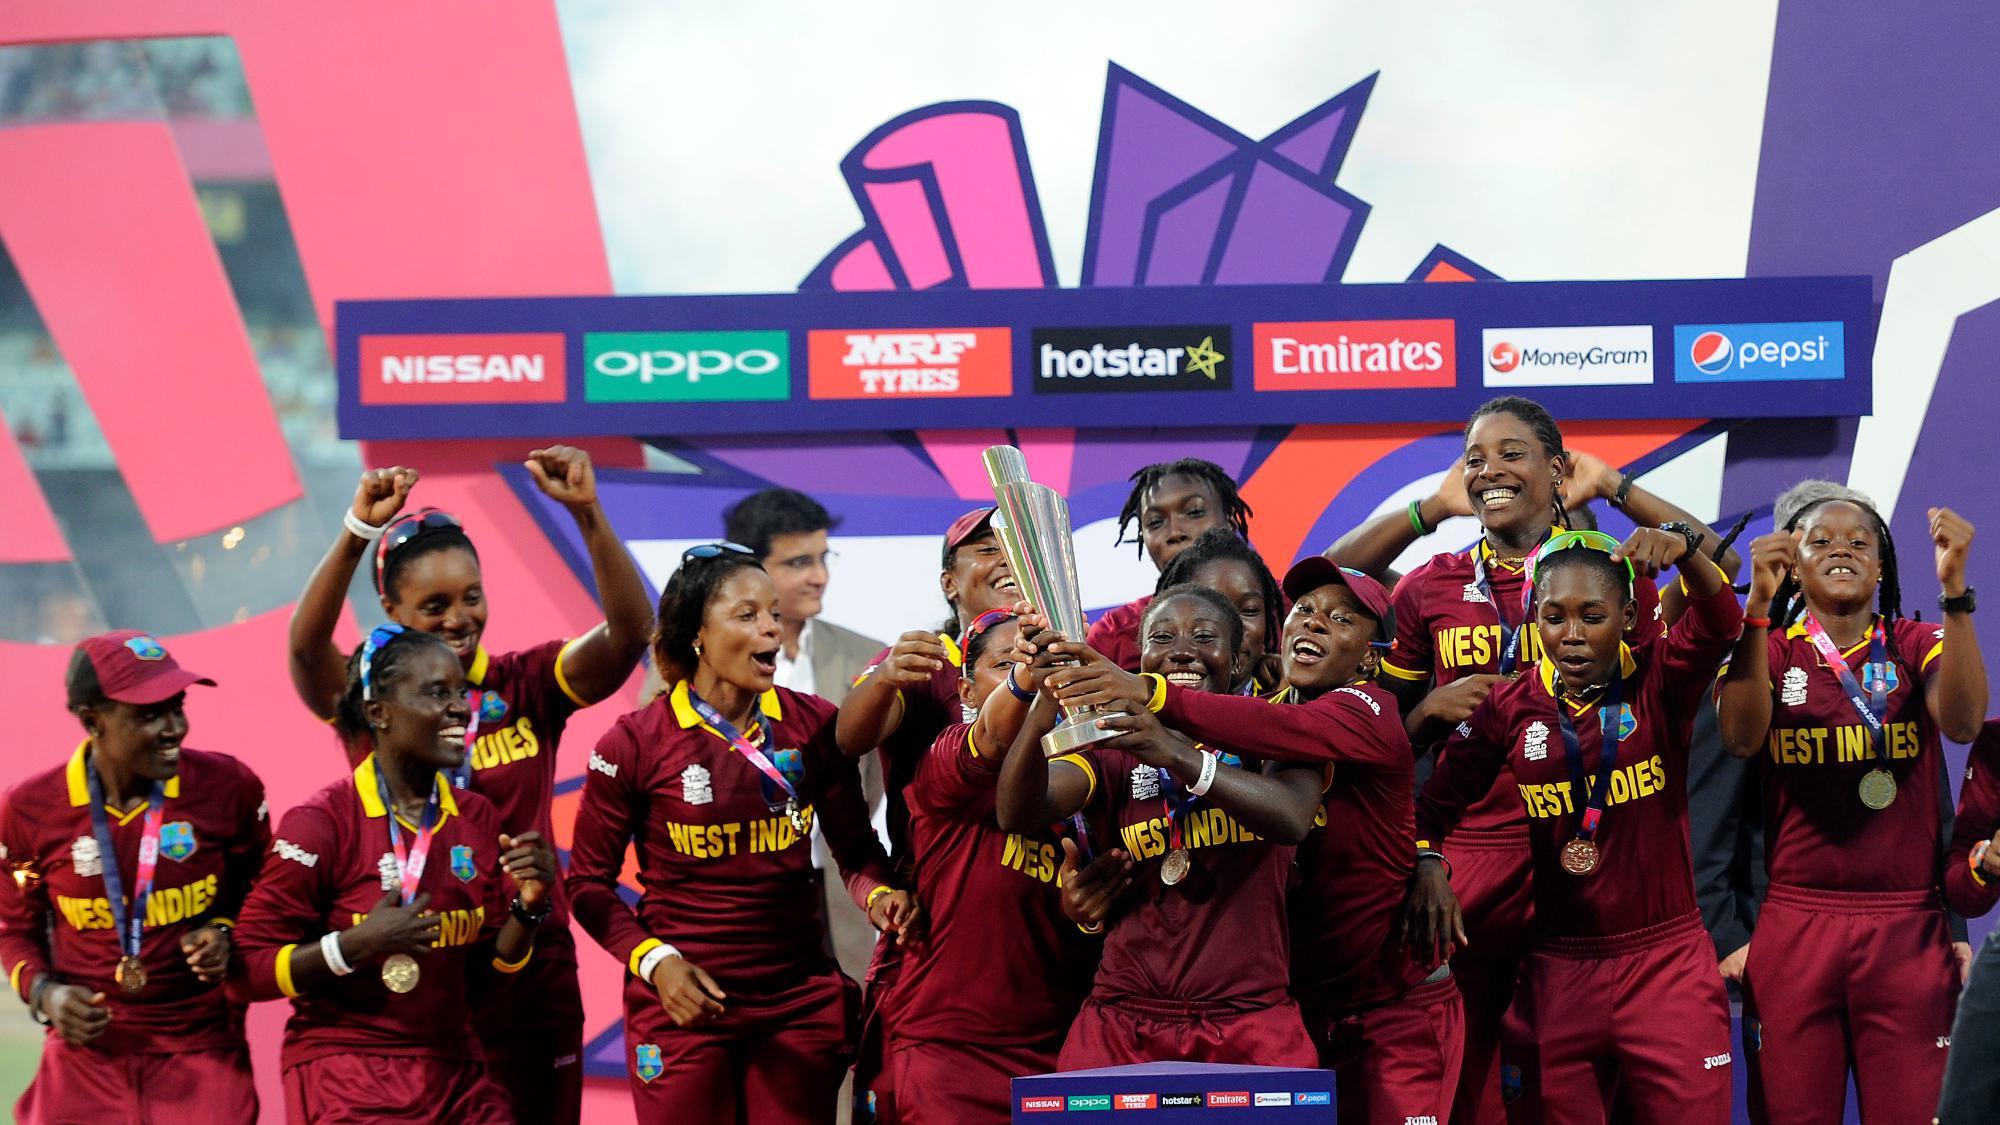 ICC Women's World T20 2018 schedule announced